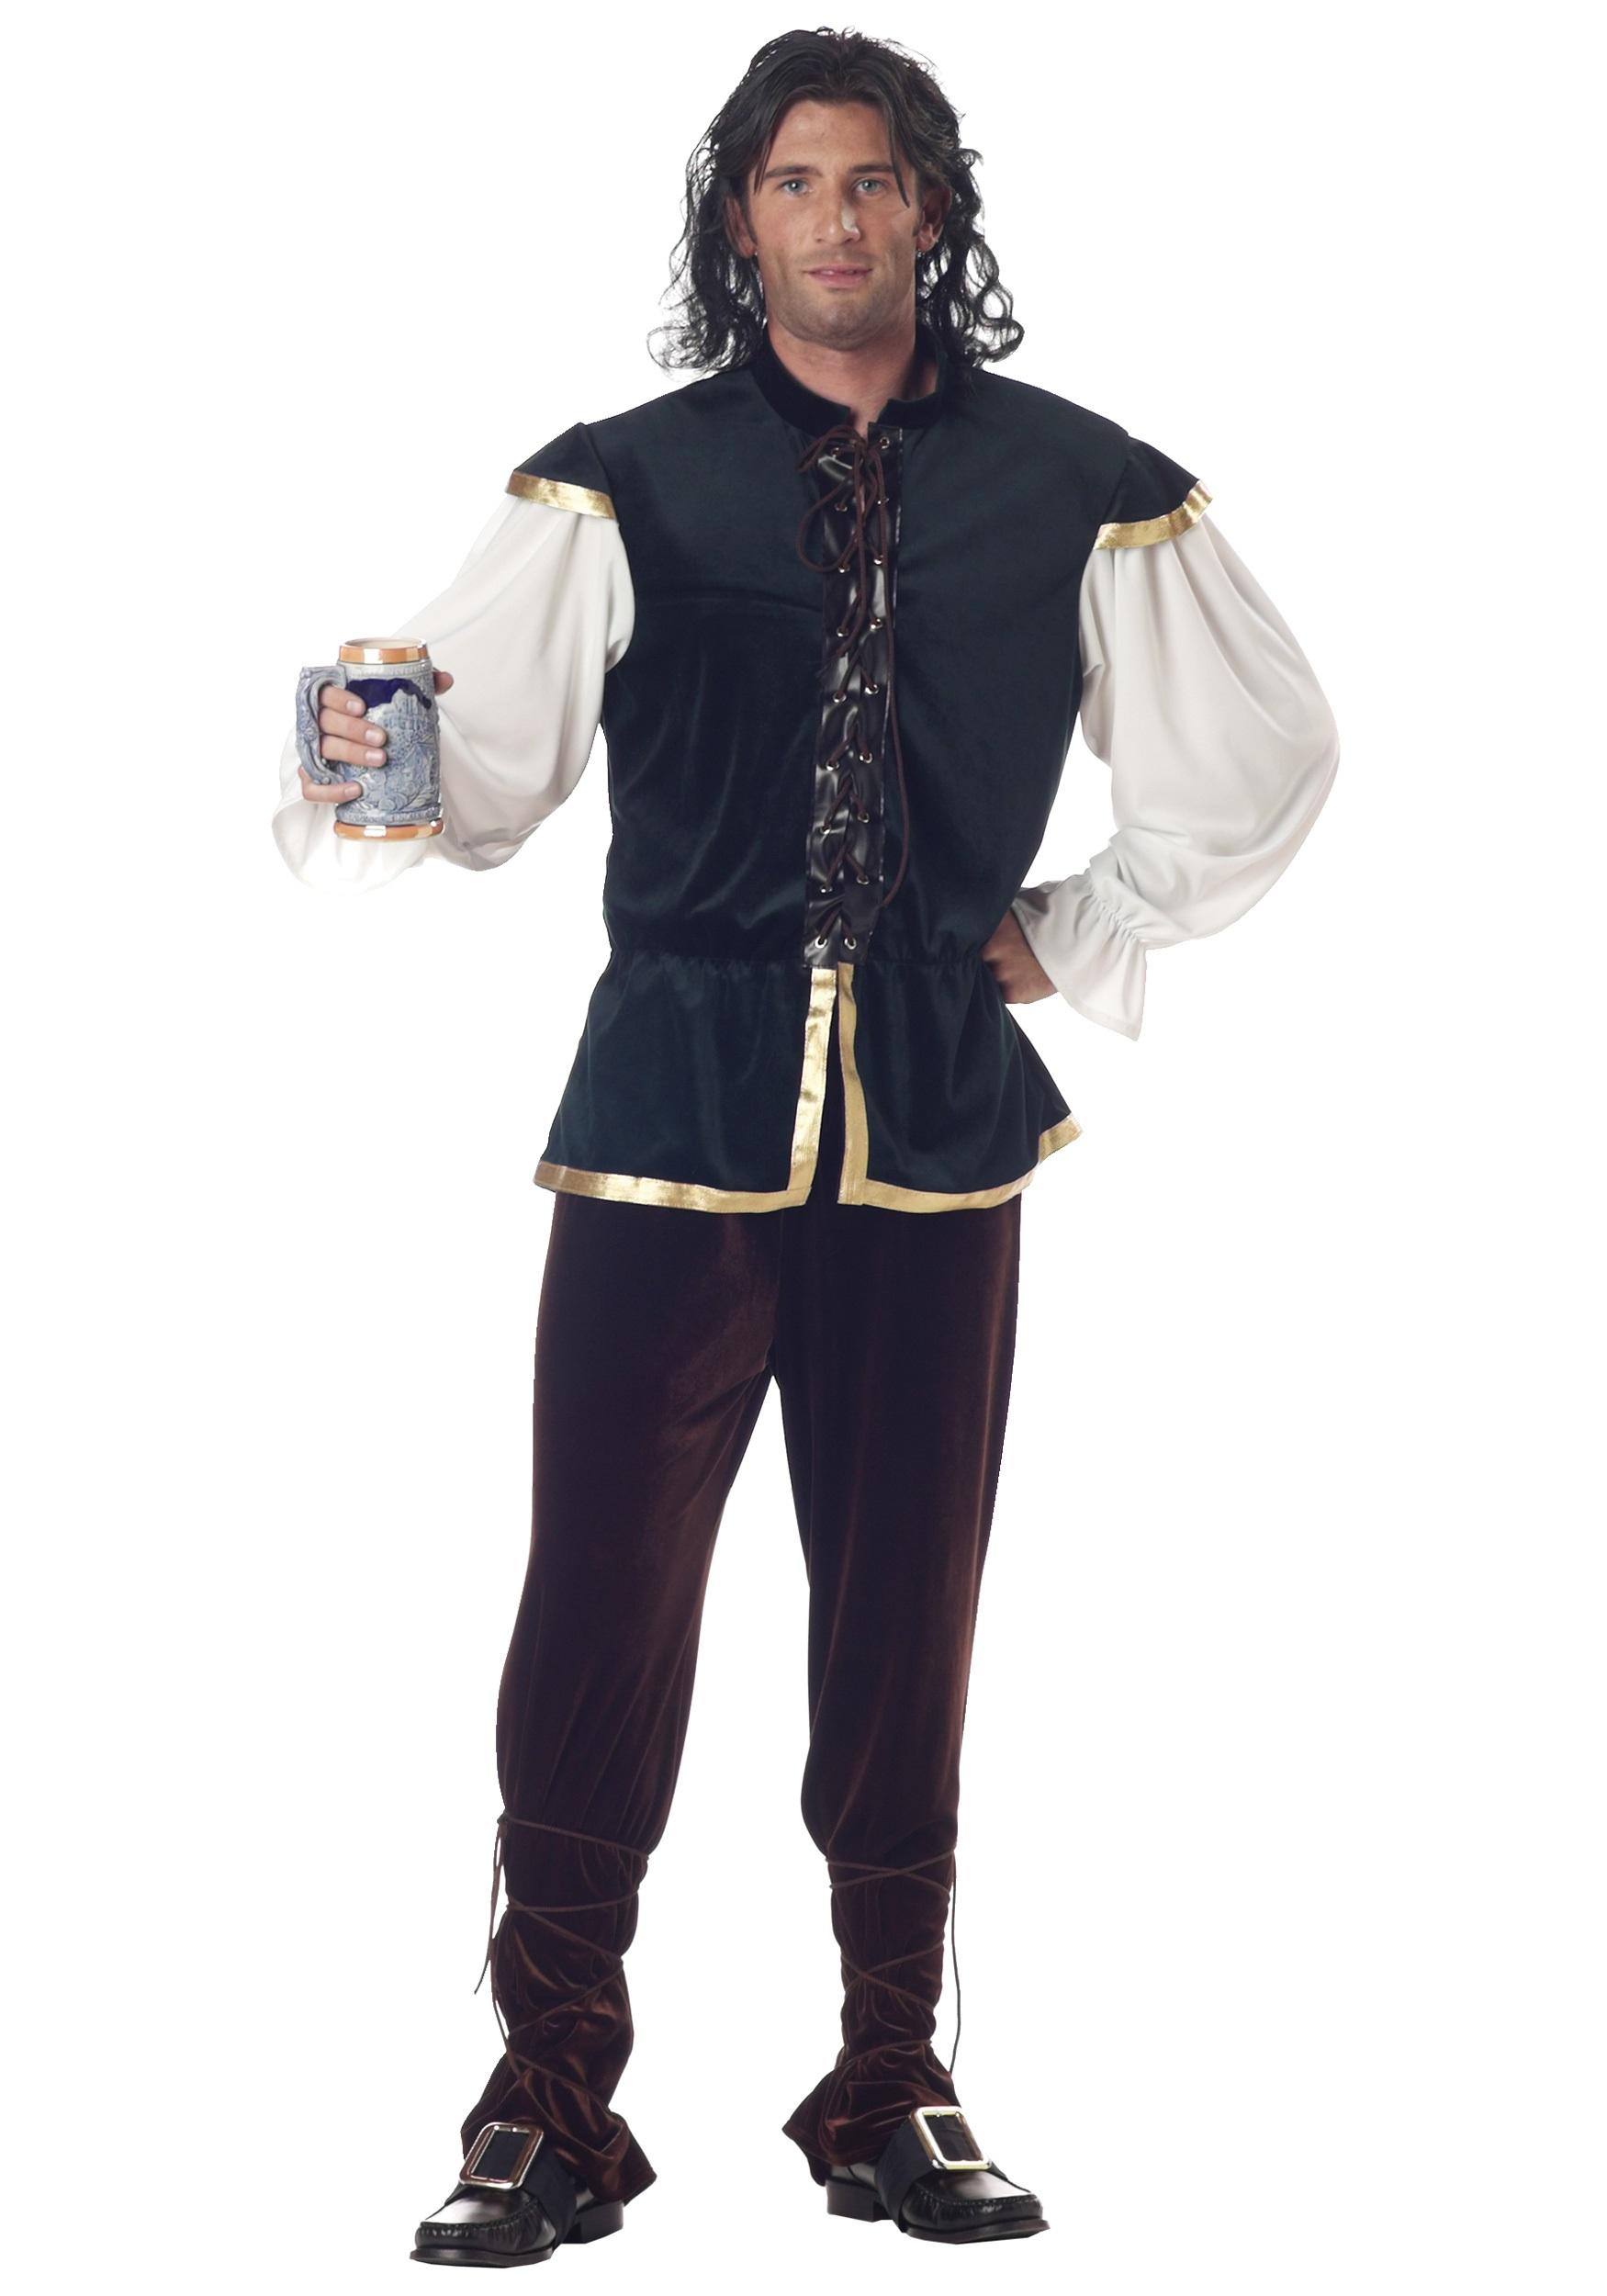 Tavern Man Costume  sc 1 st  Halloween Costumes & Renaissance Tavern Man Costume for Men